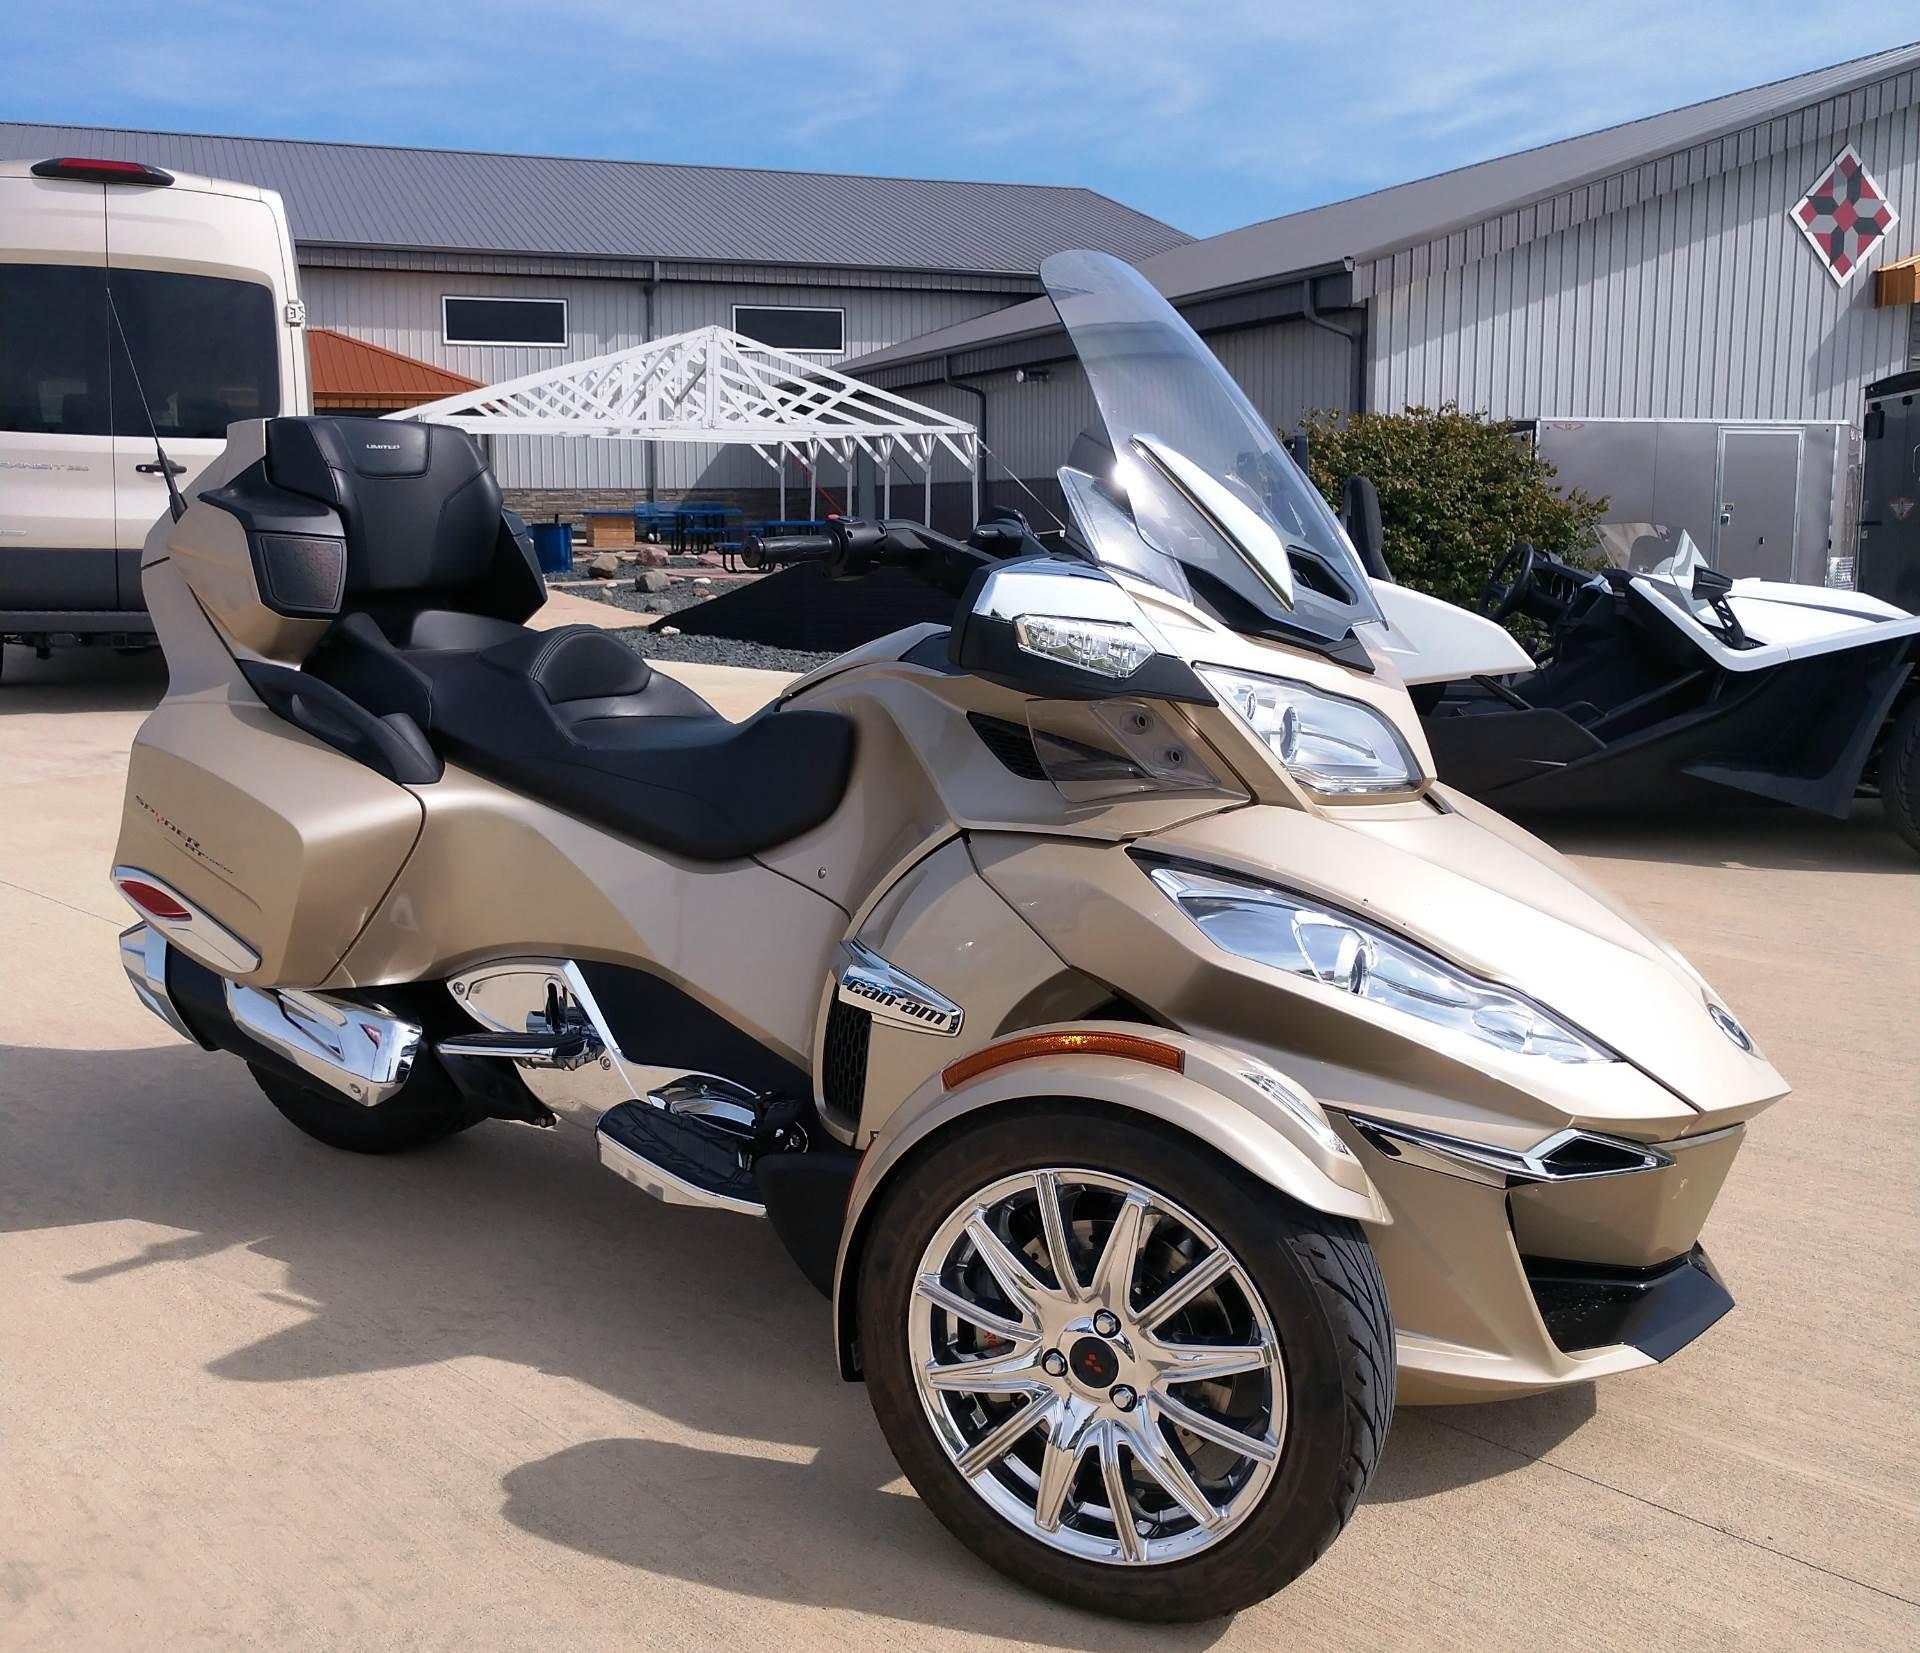 2017 Can Am Spyder Rt Limited In Ottumwa Iowa